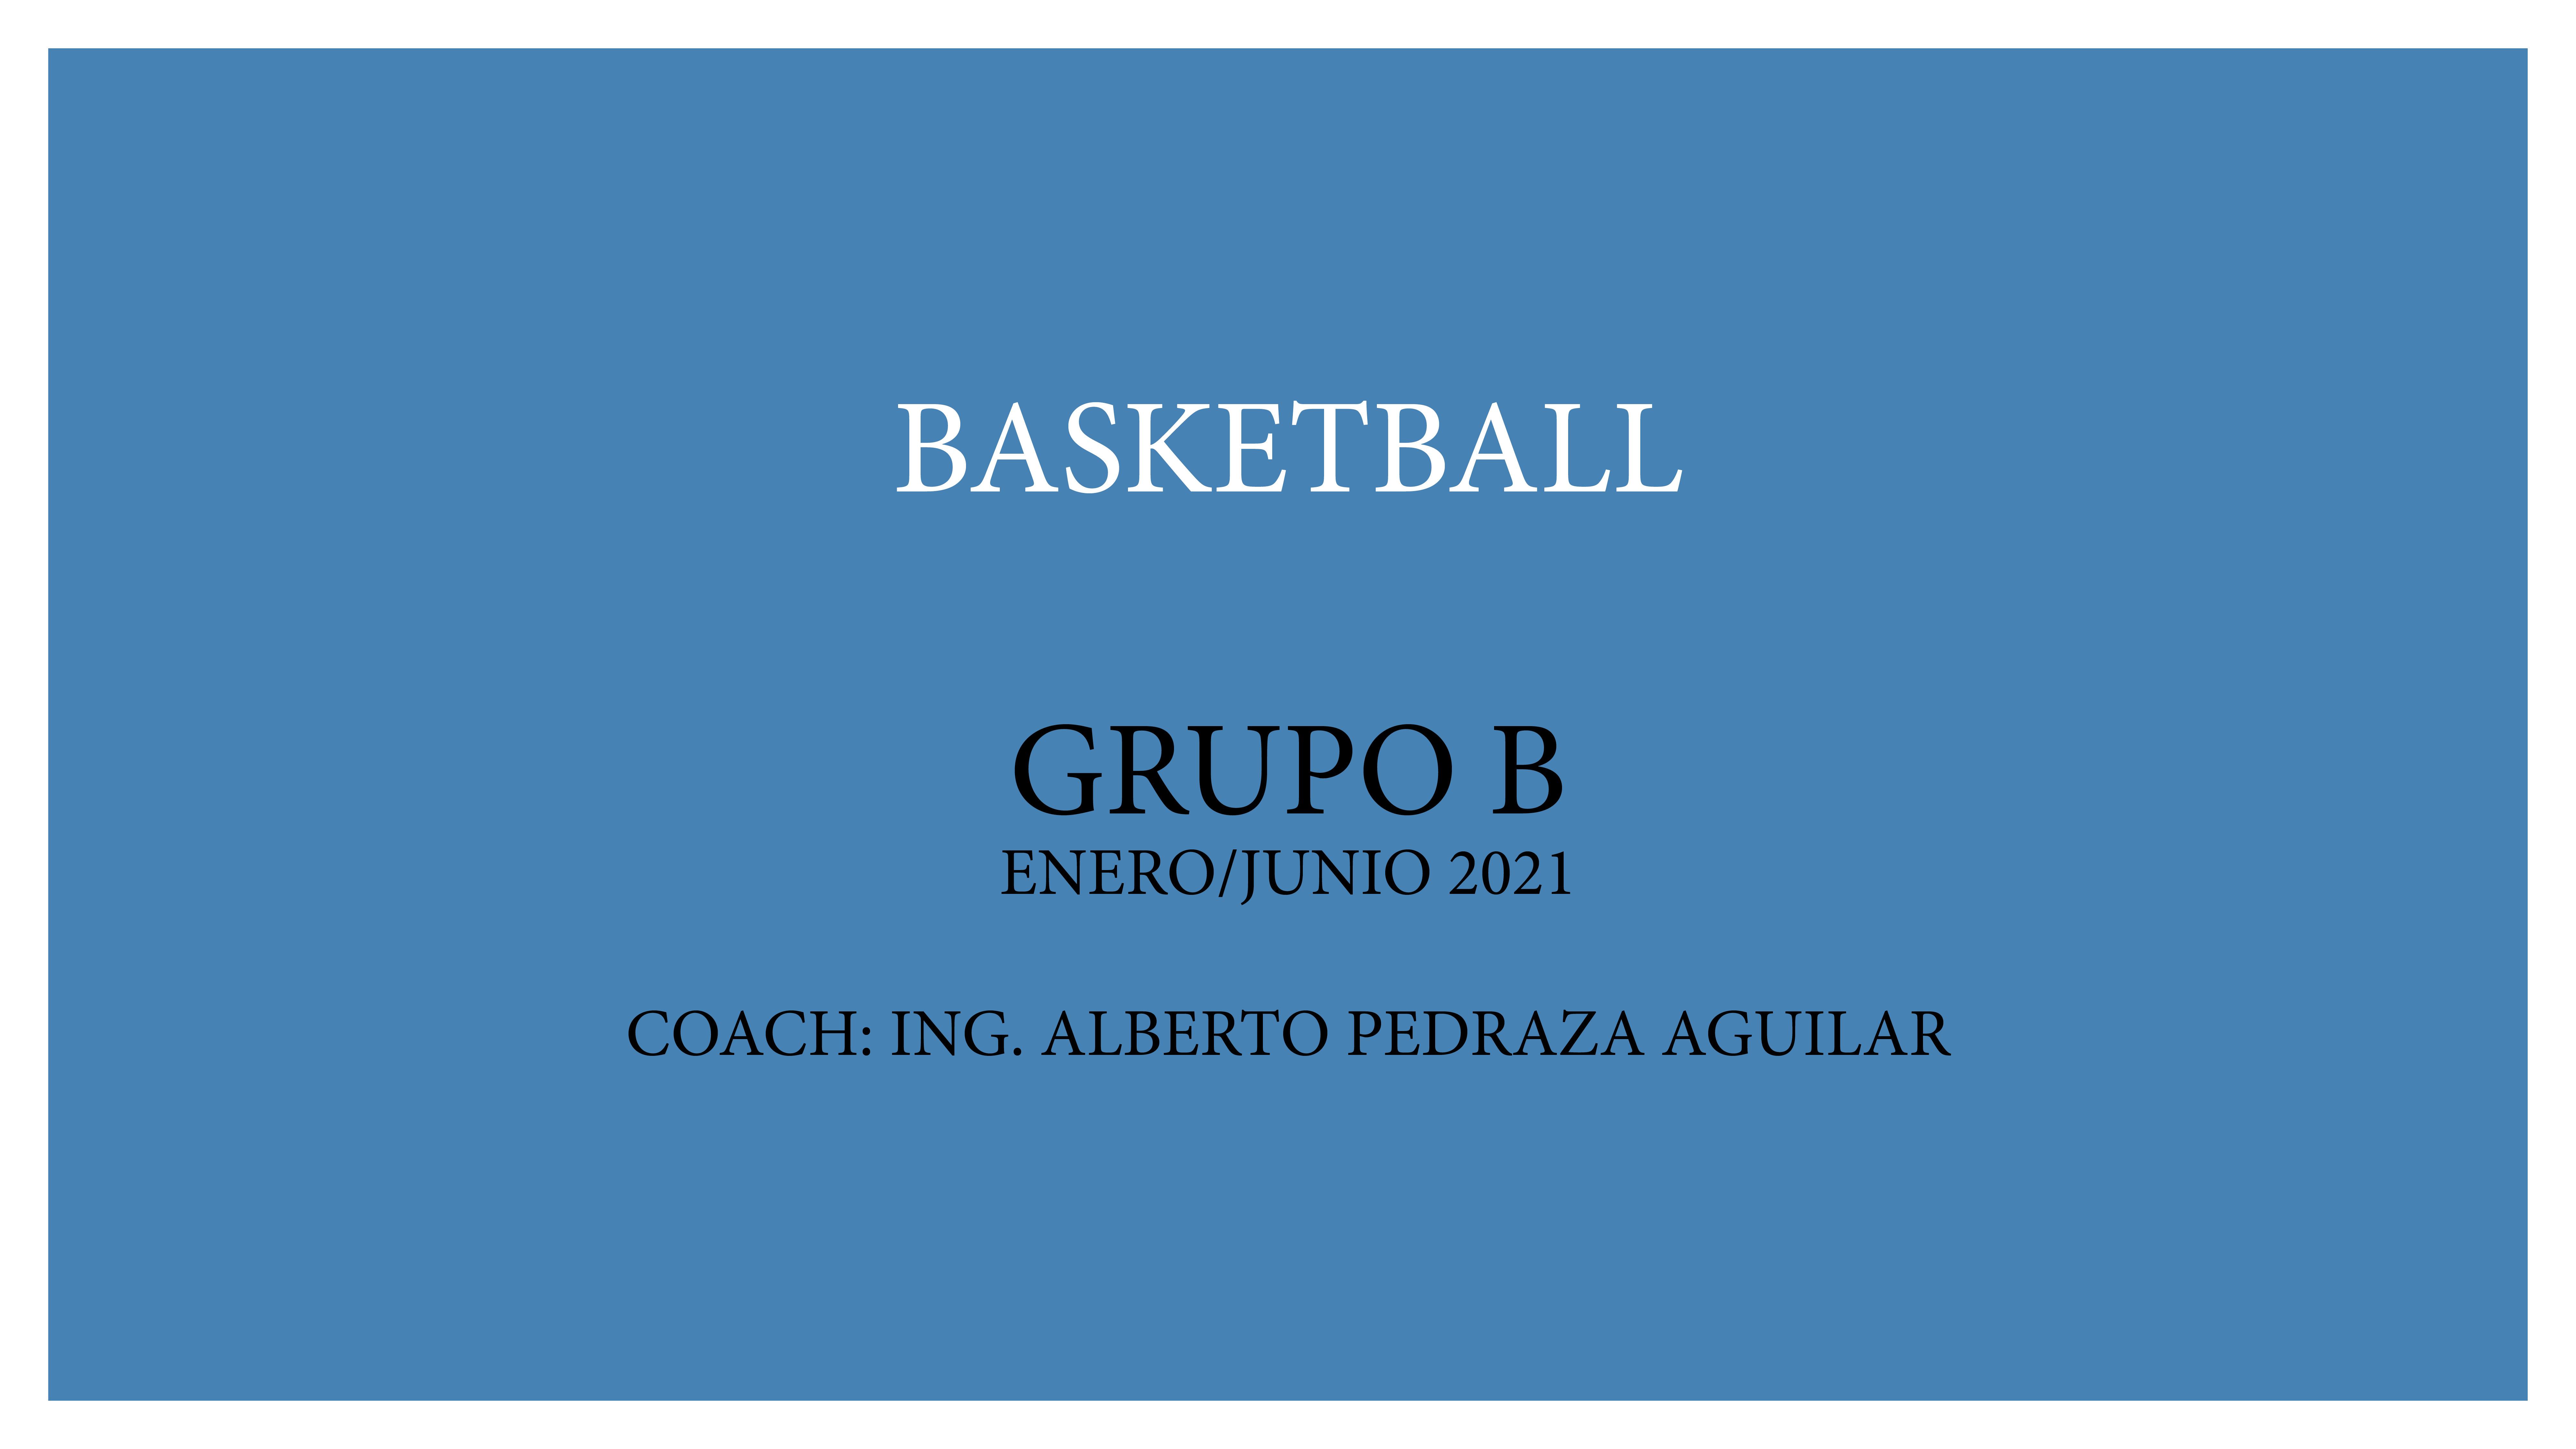 Basketball Extra escolar Grupo B